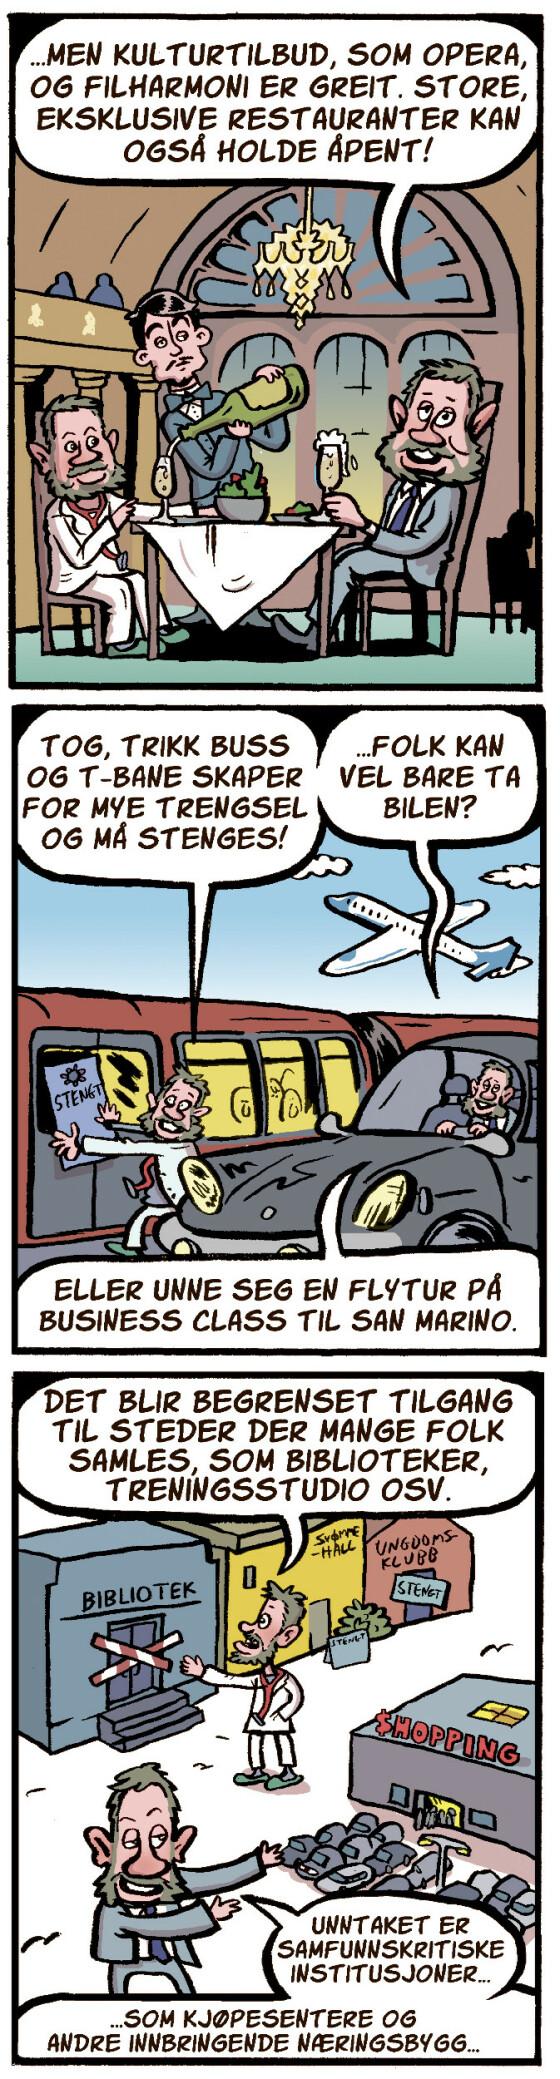 Bent Høies gigaskvis